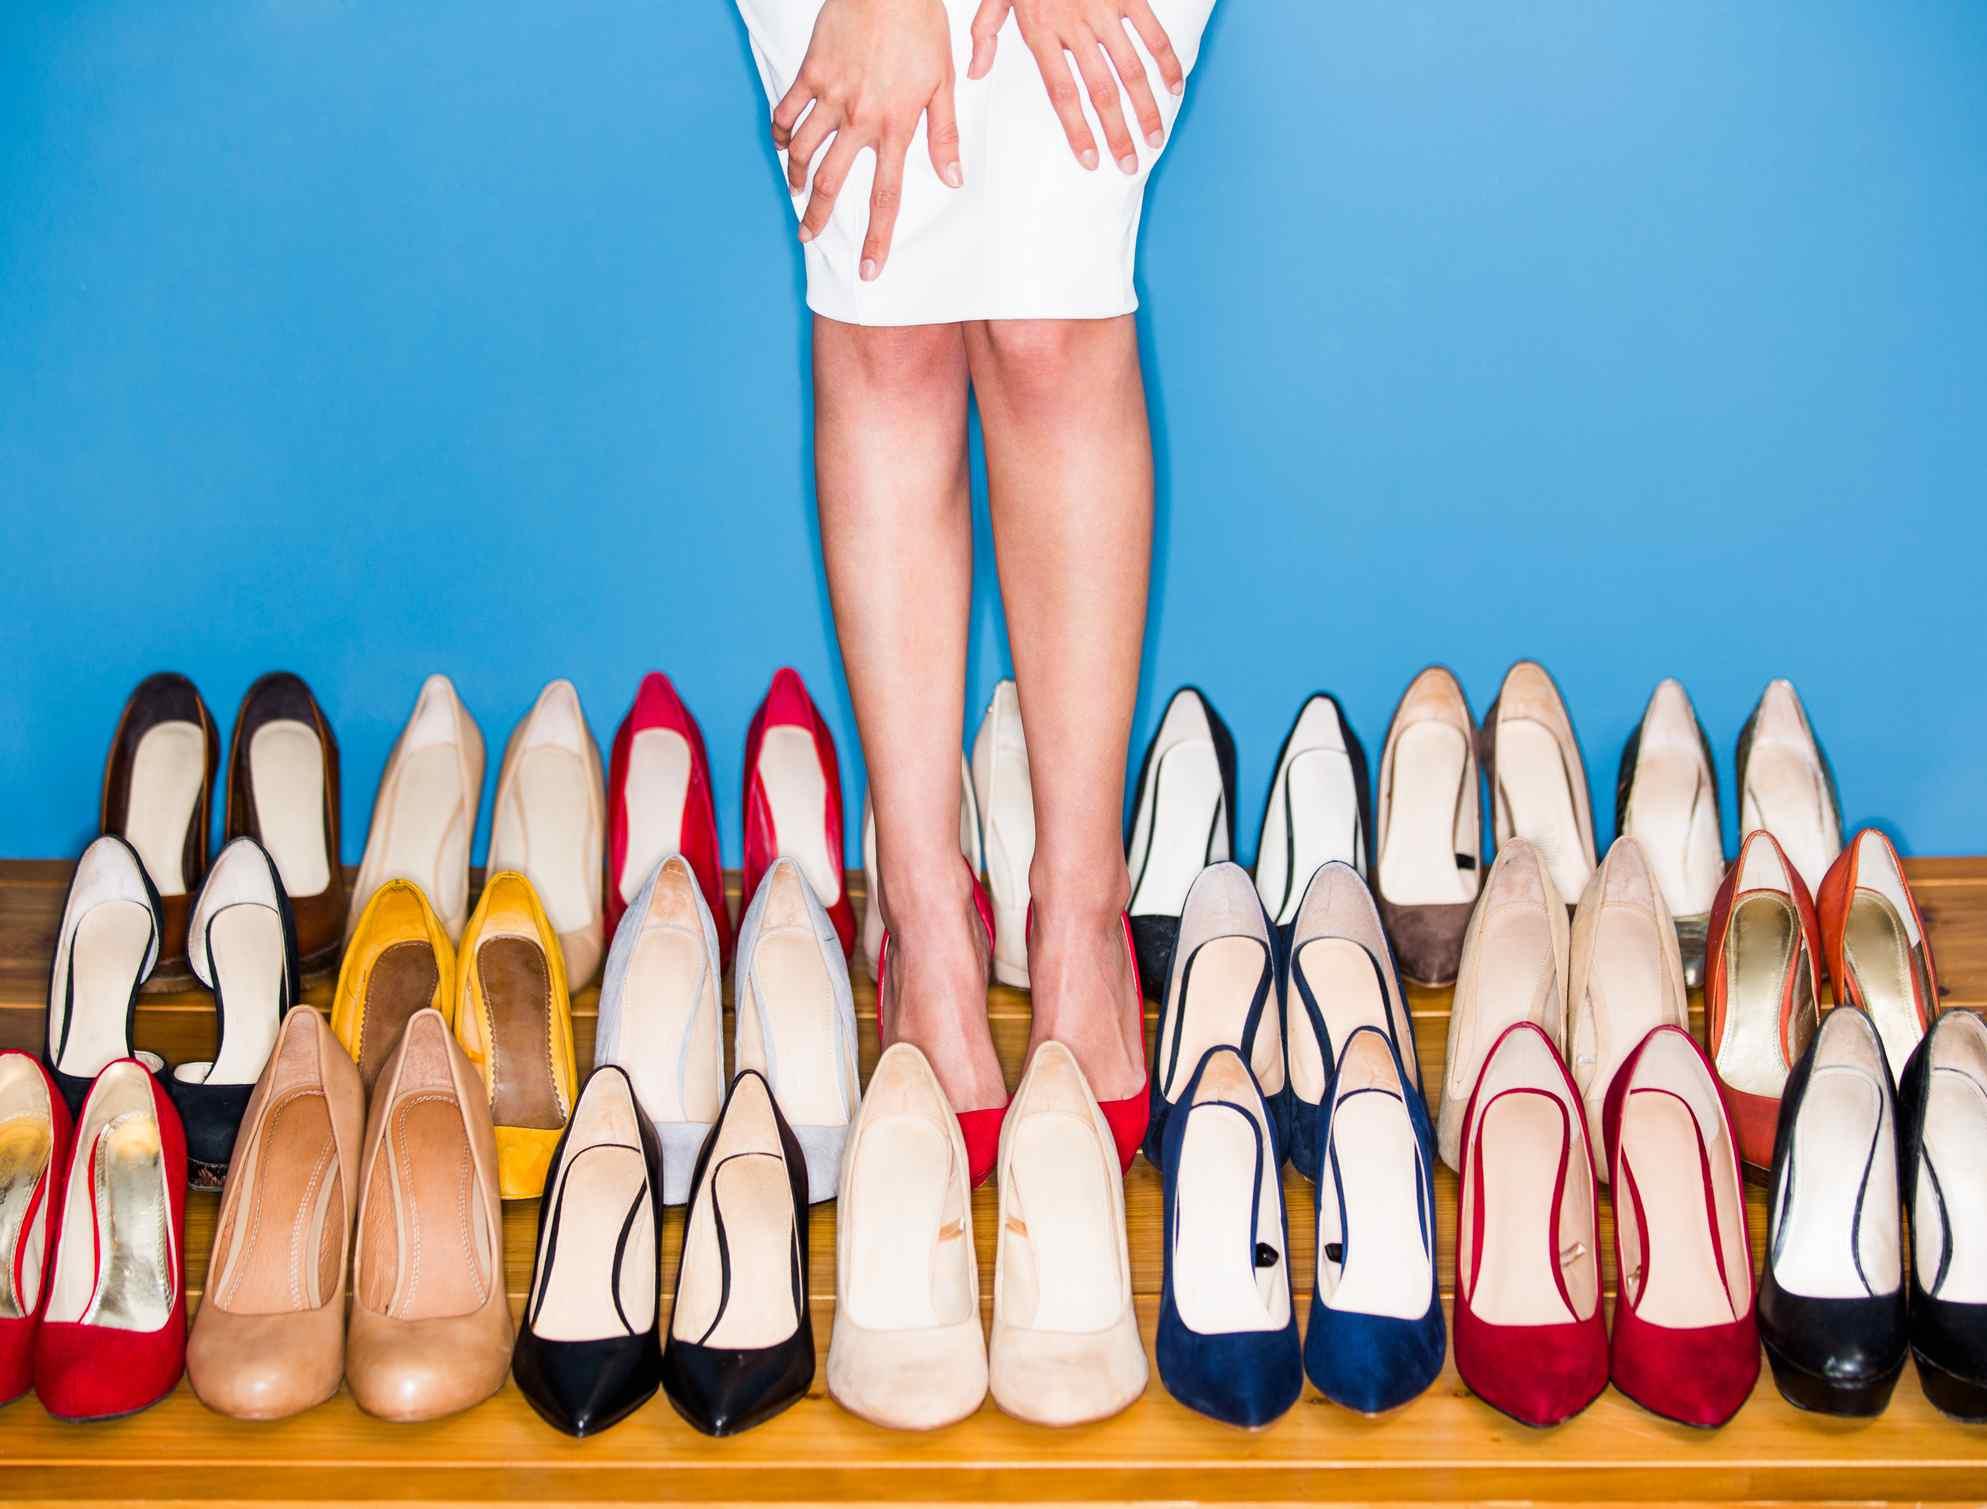 View of woman wearing high heels